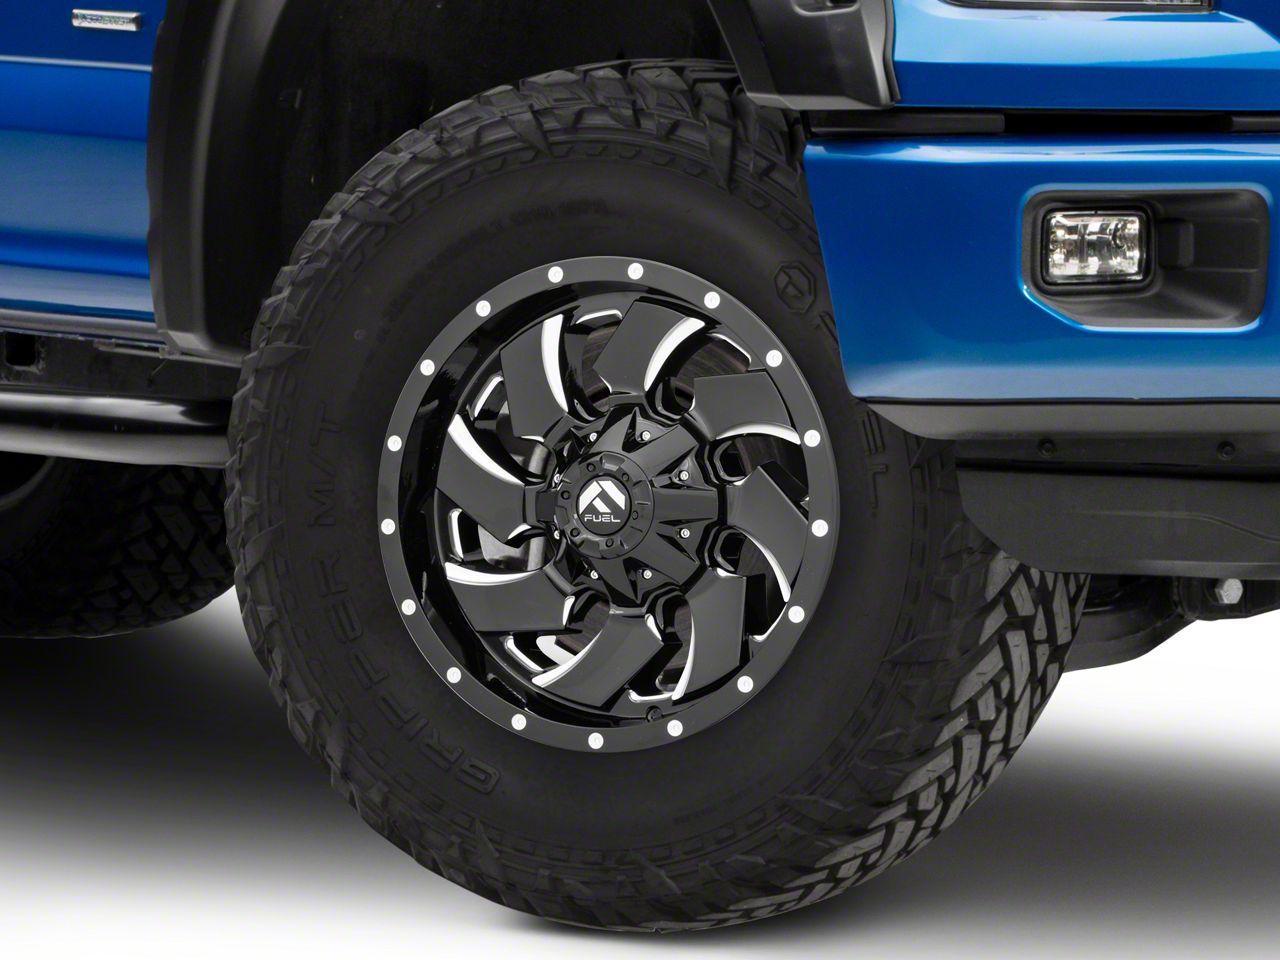 Fuel Wheels Cleaver Black Milled 6-Lug Wheel - 18x9 (04-19 F-150)